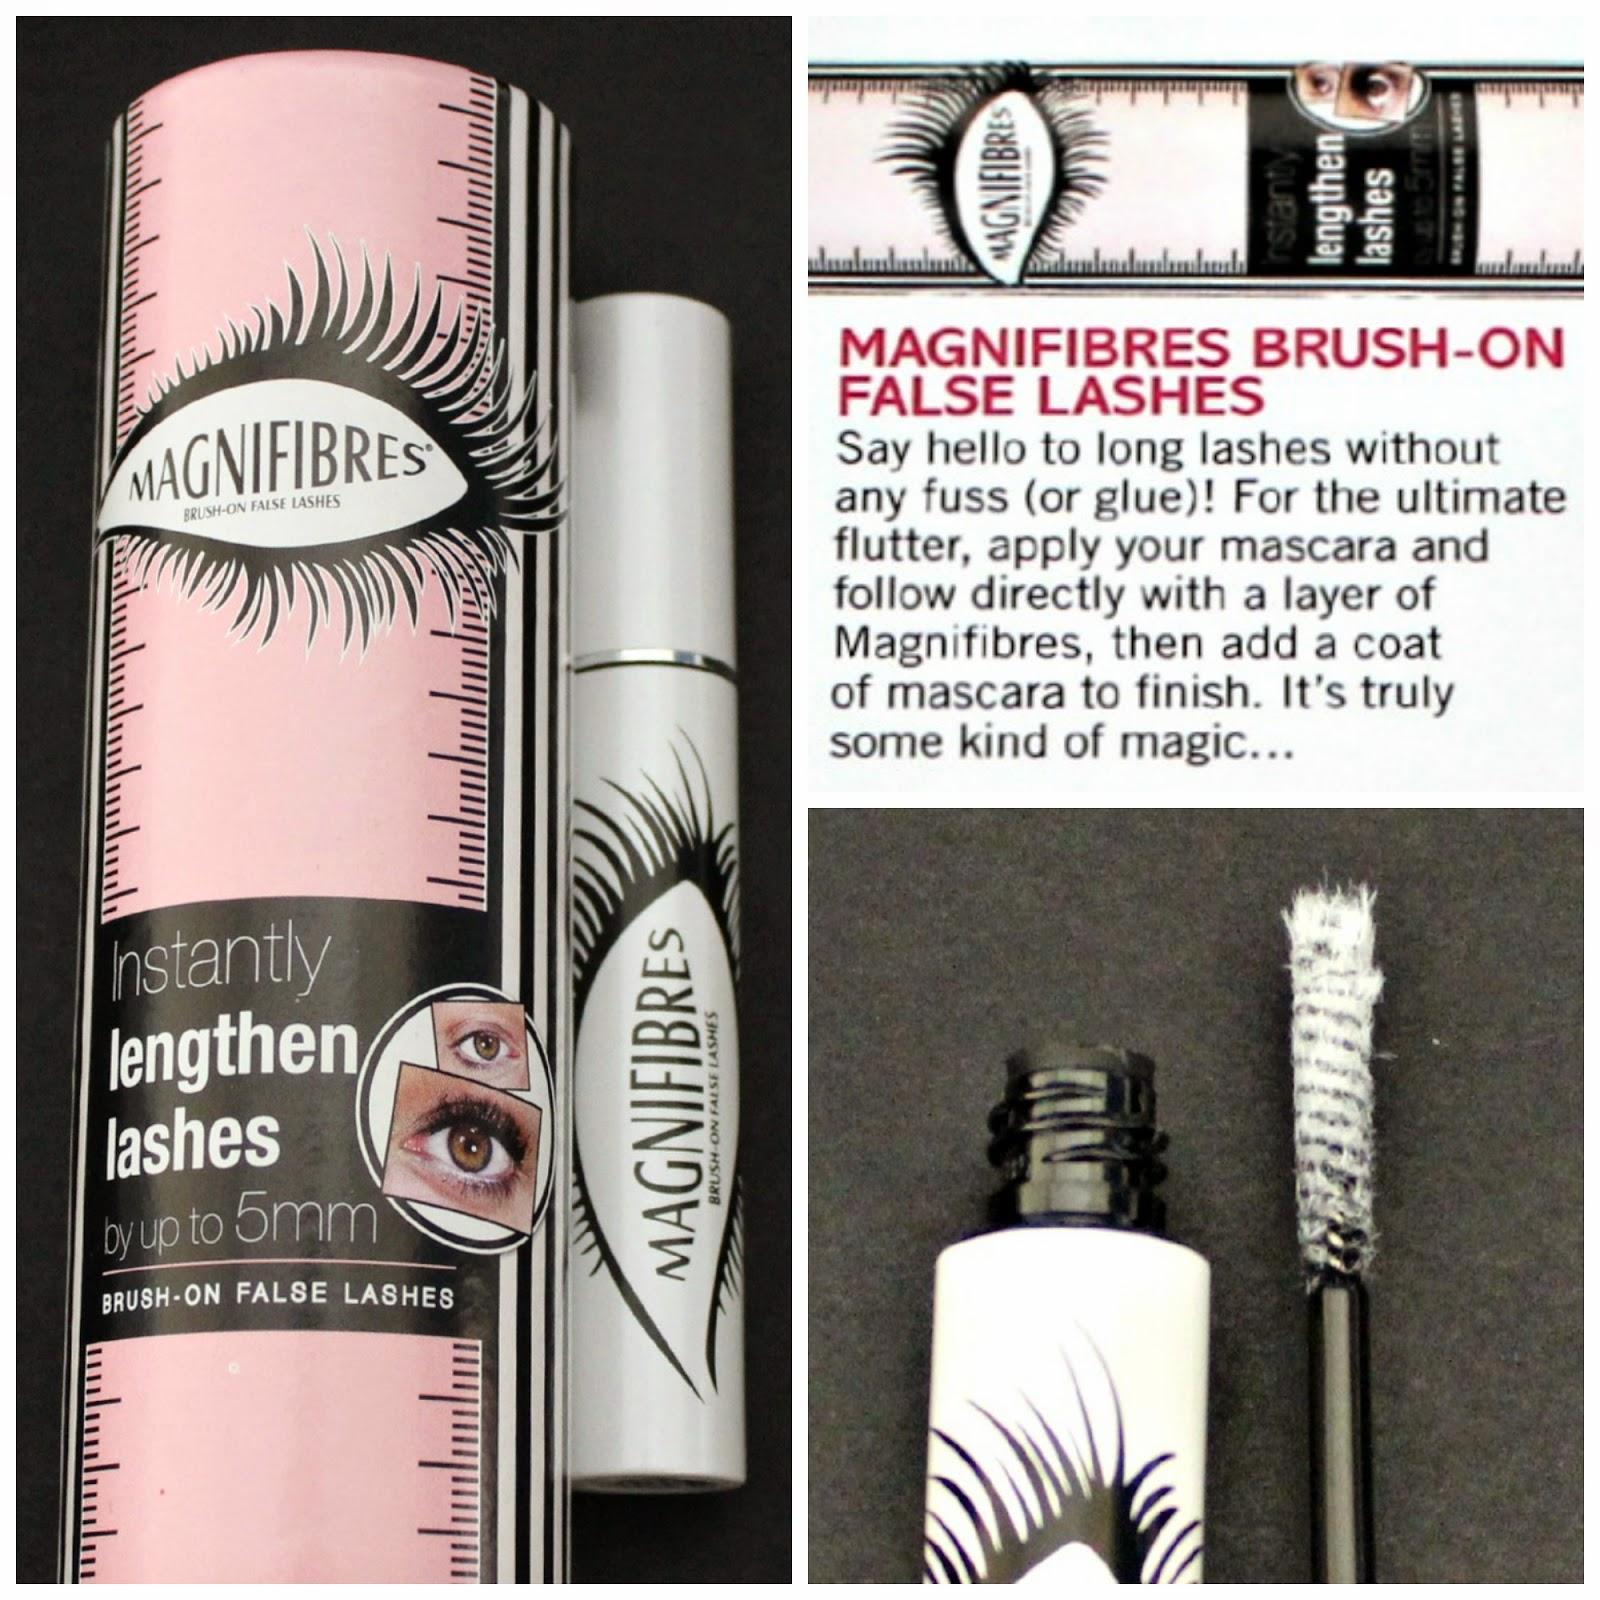 Magnifibres lashes